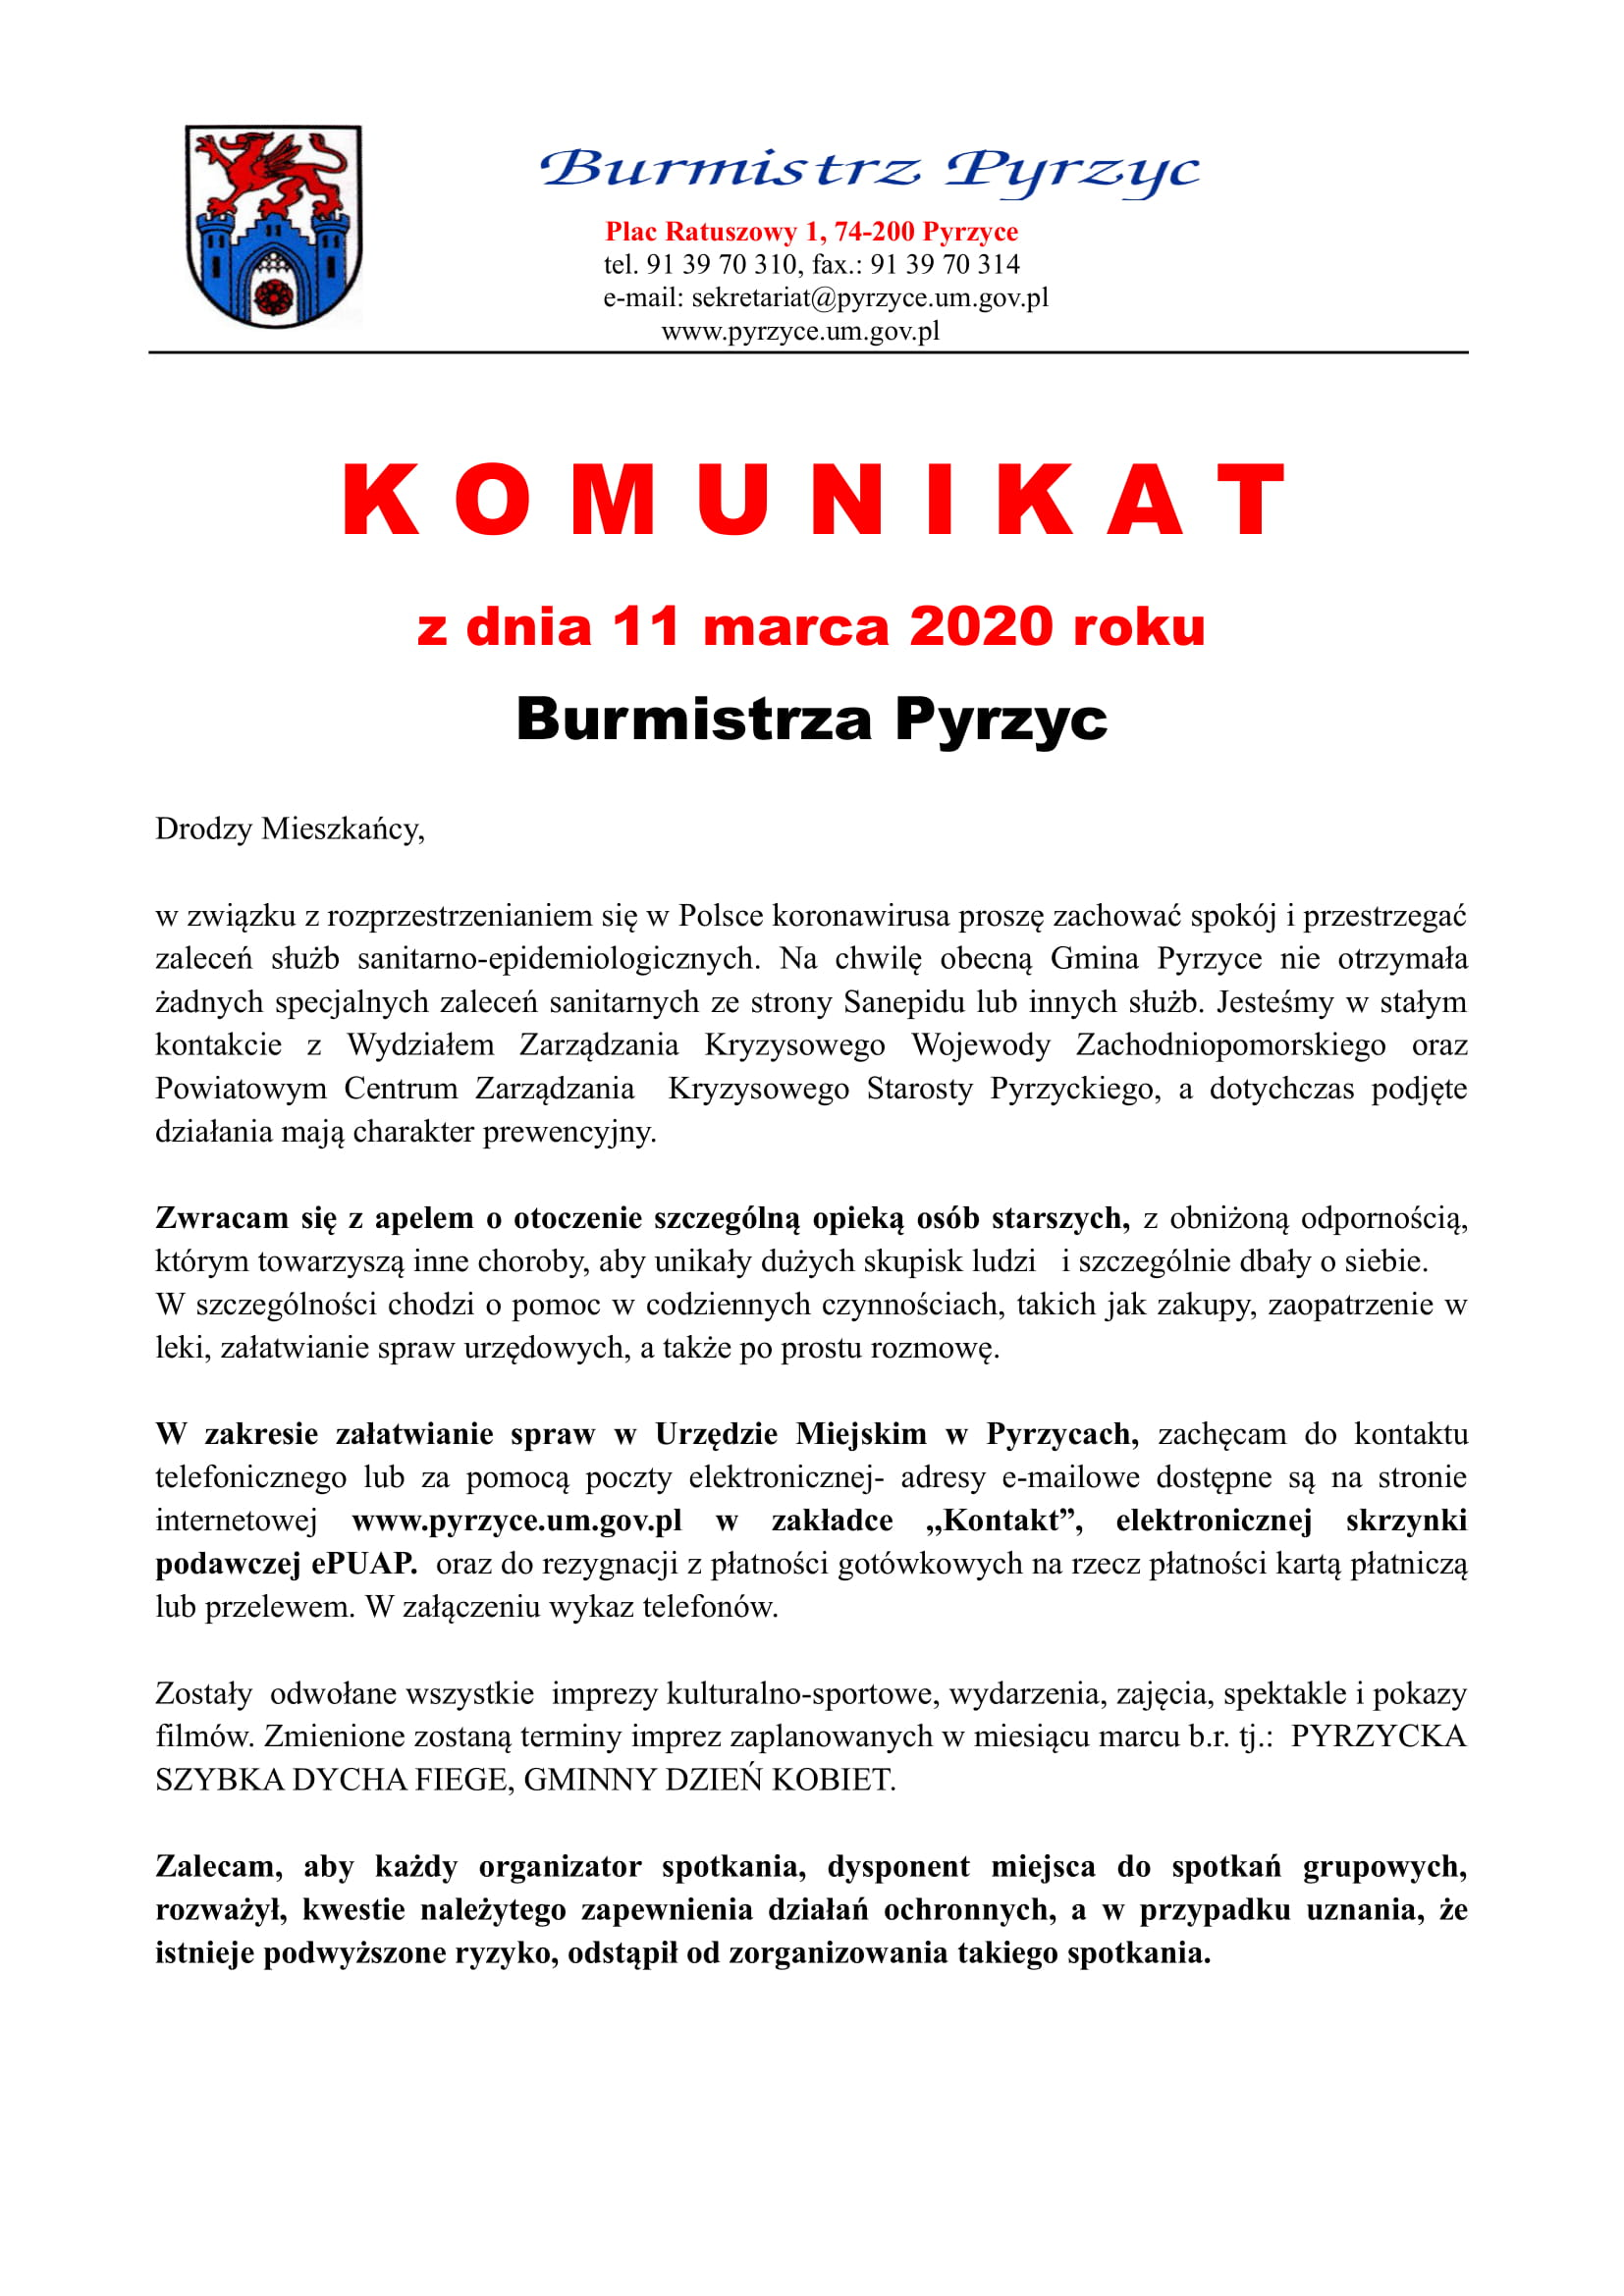 Komunikat Burmistrza.doc 2-2-1-1